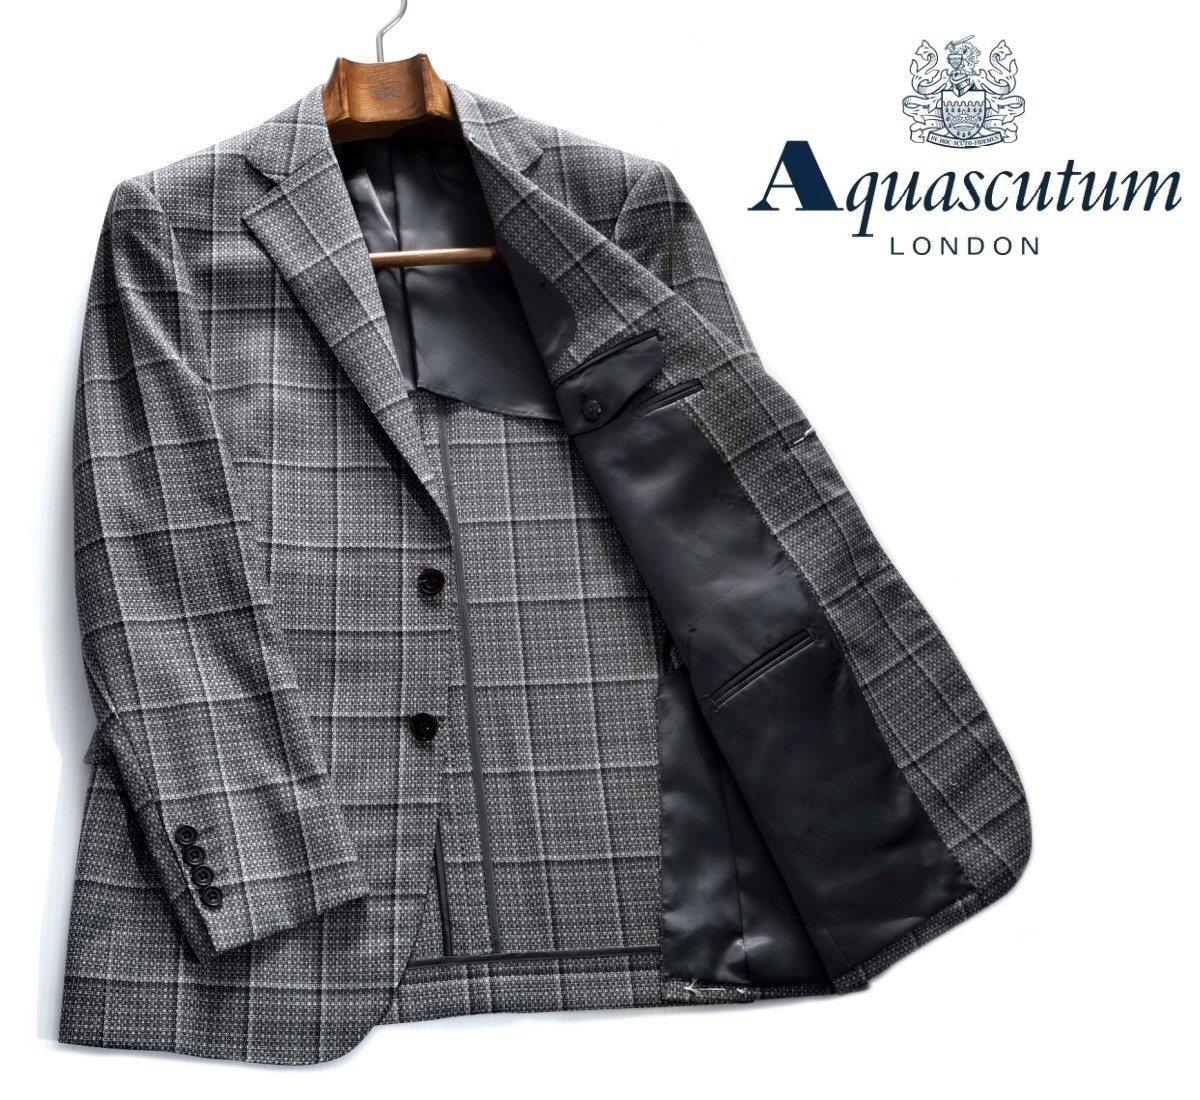 Aquascutum【アクアスキュータム】定価154,000円(税込)◆60%OFF◆日本製ウィンドペンウールジャケットグレー背抜き仕立て